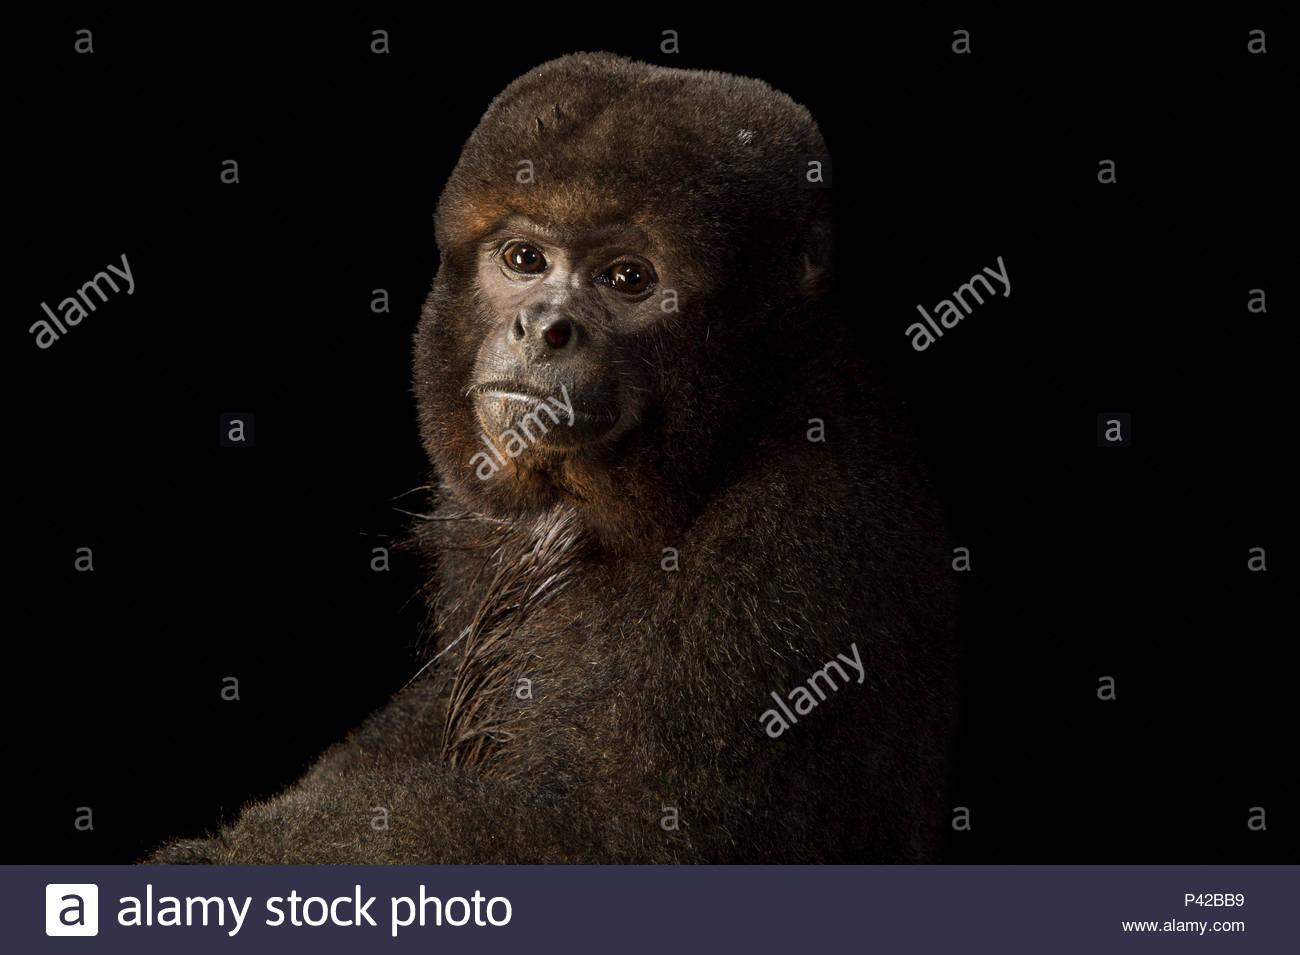 A brown woolly monkey, Lagothrix lagothrica lagothrica, at Piscilago Zoo. - Stock Image